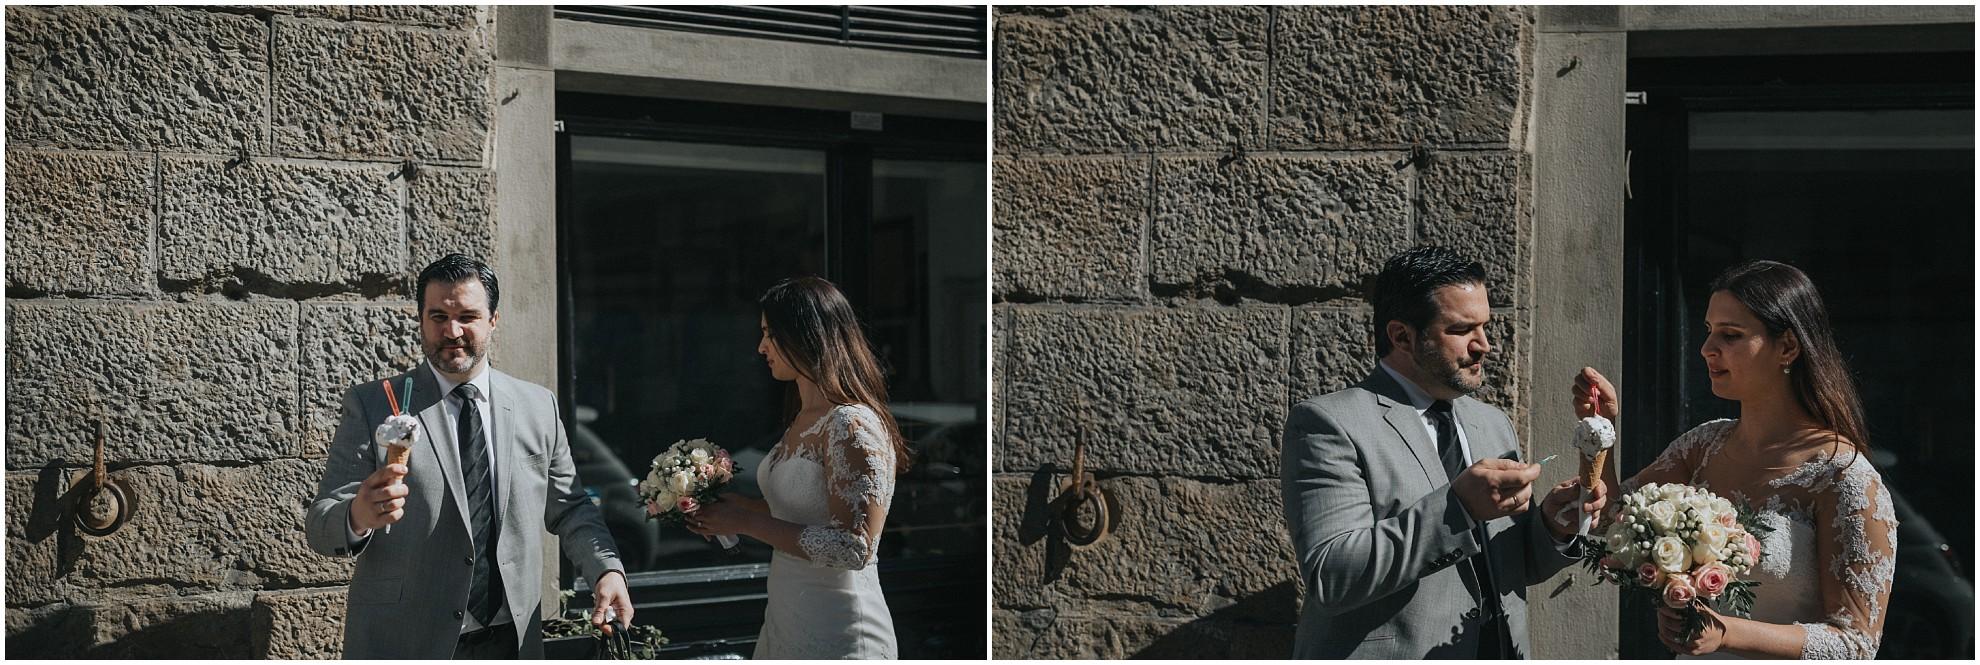 florence-wedding-photographer-039